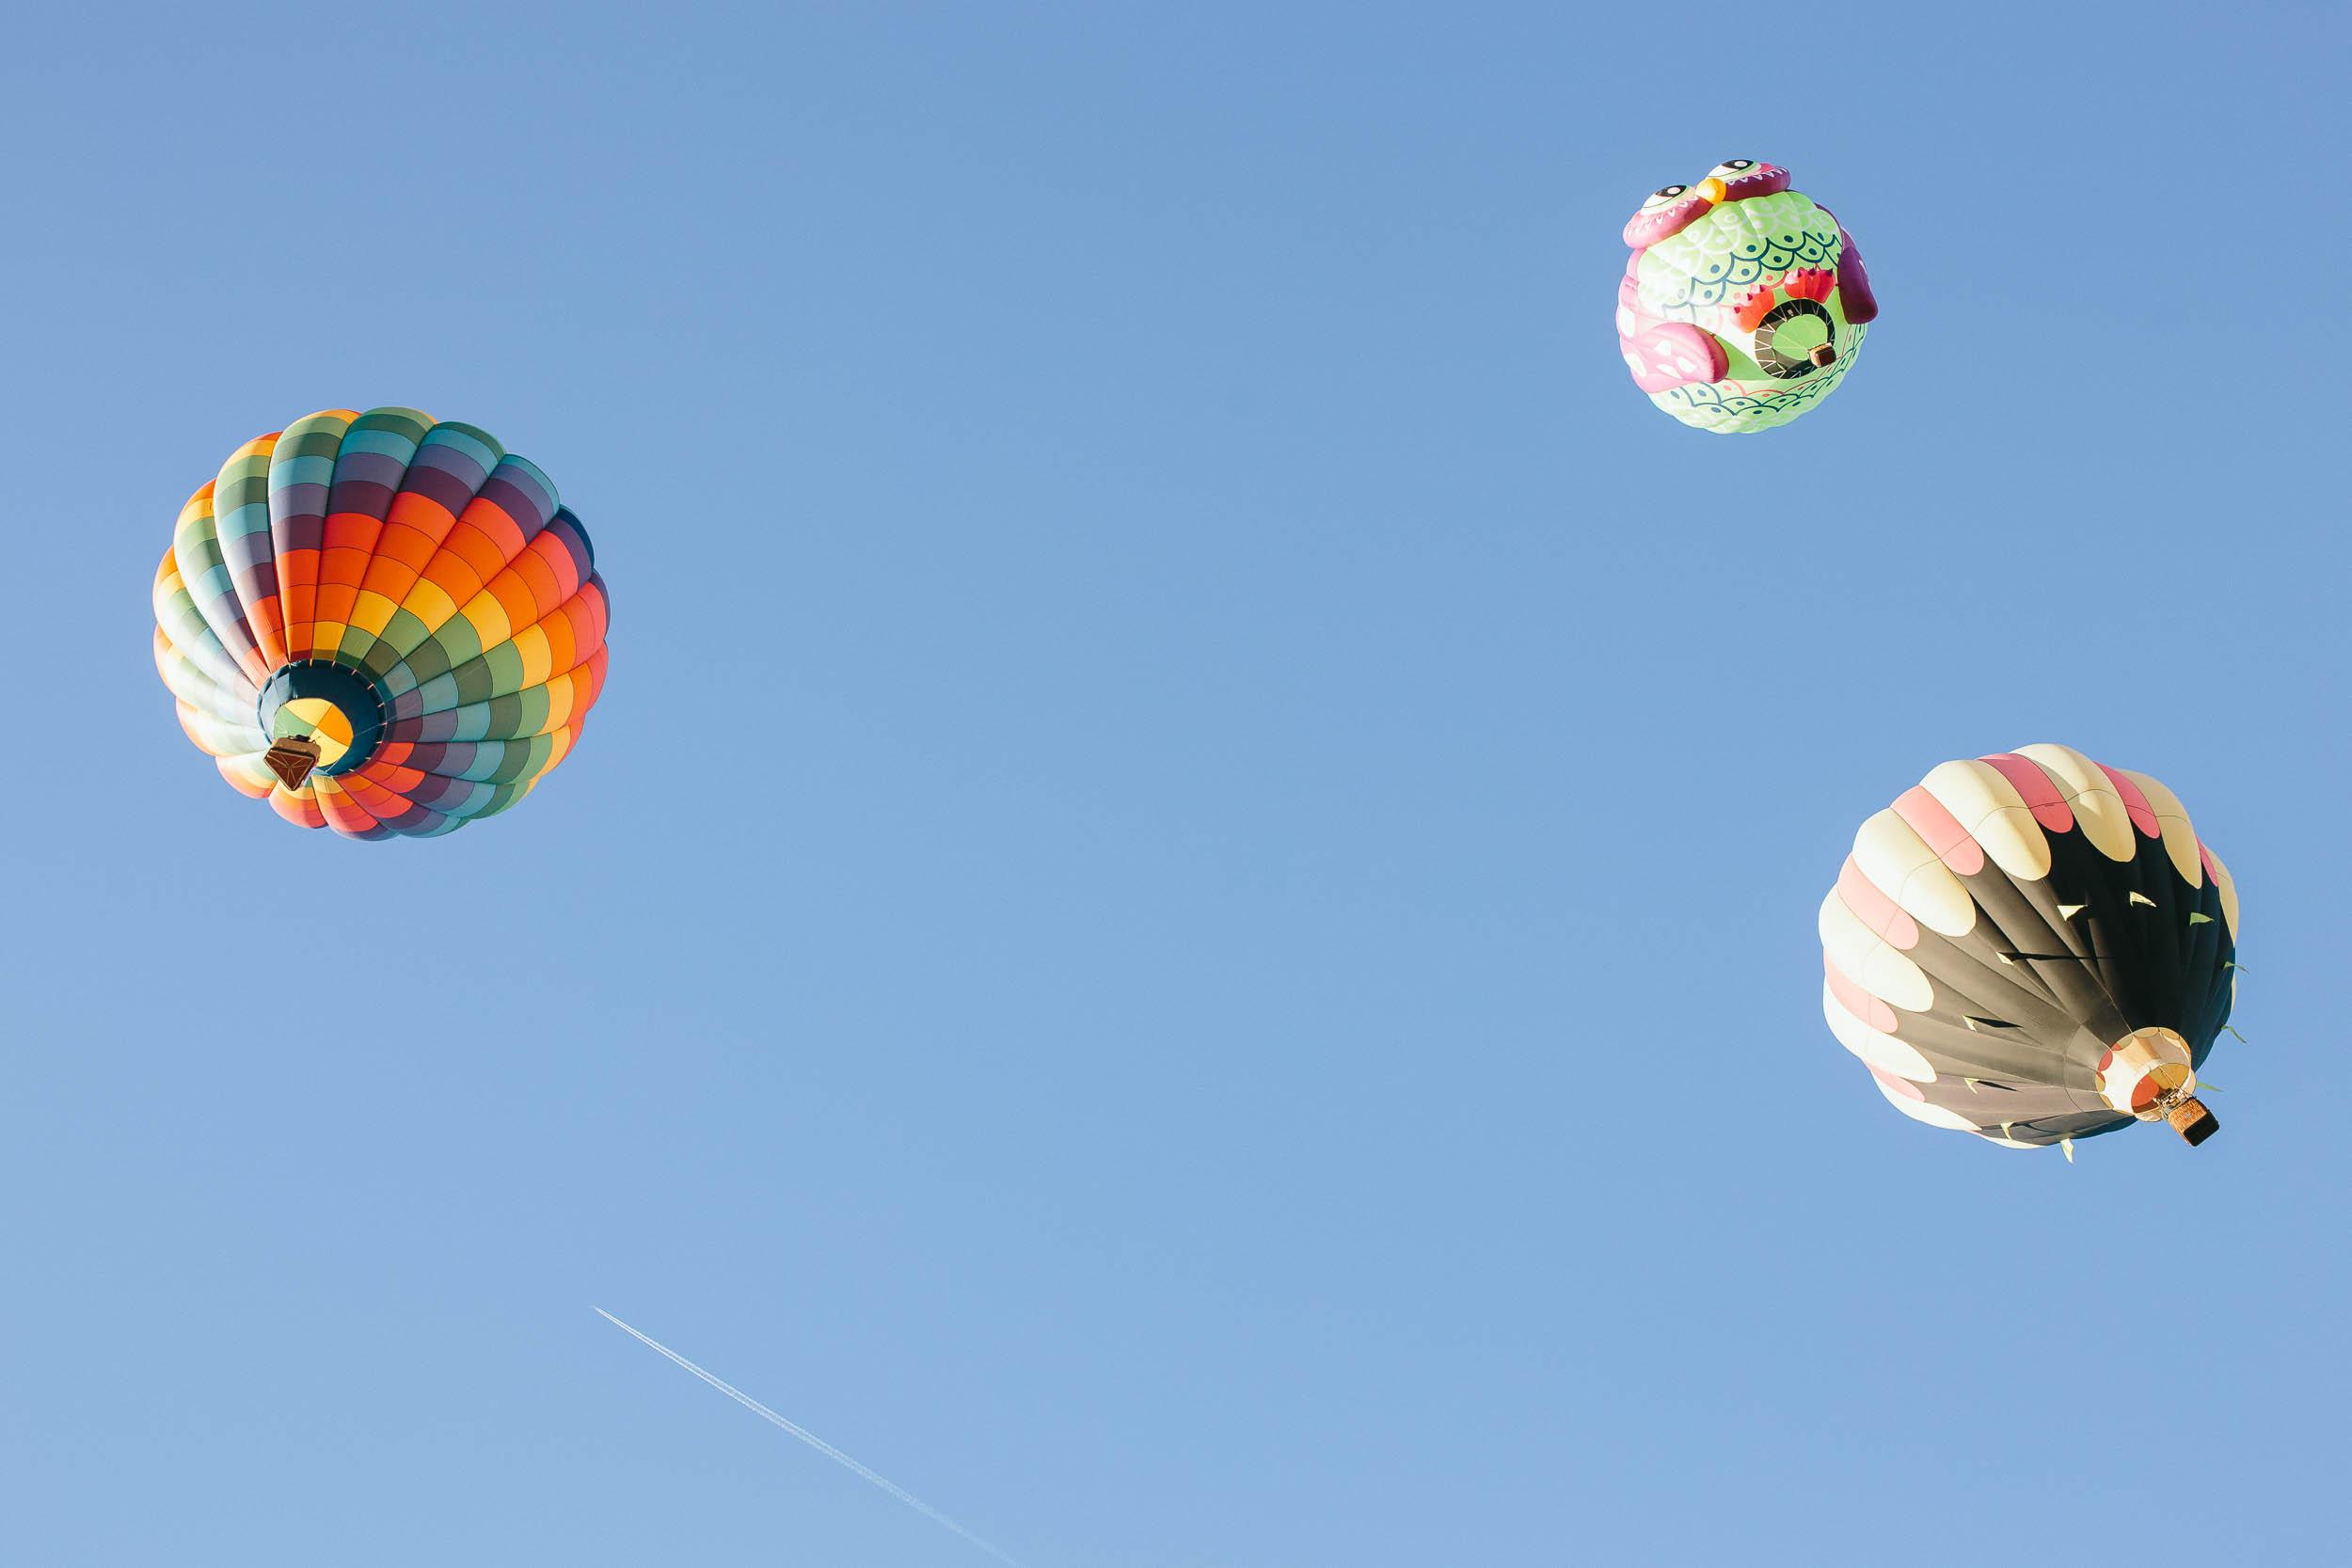 Kyle-Sheppard-Kanab-Balloon-Festival-12.jpg